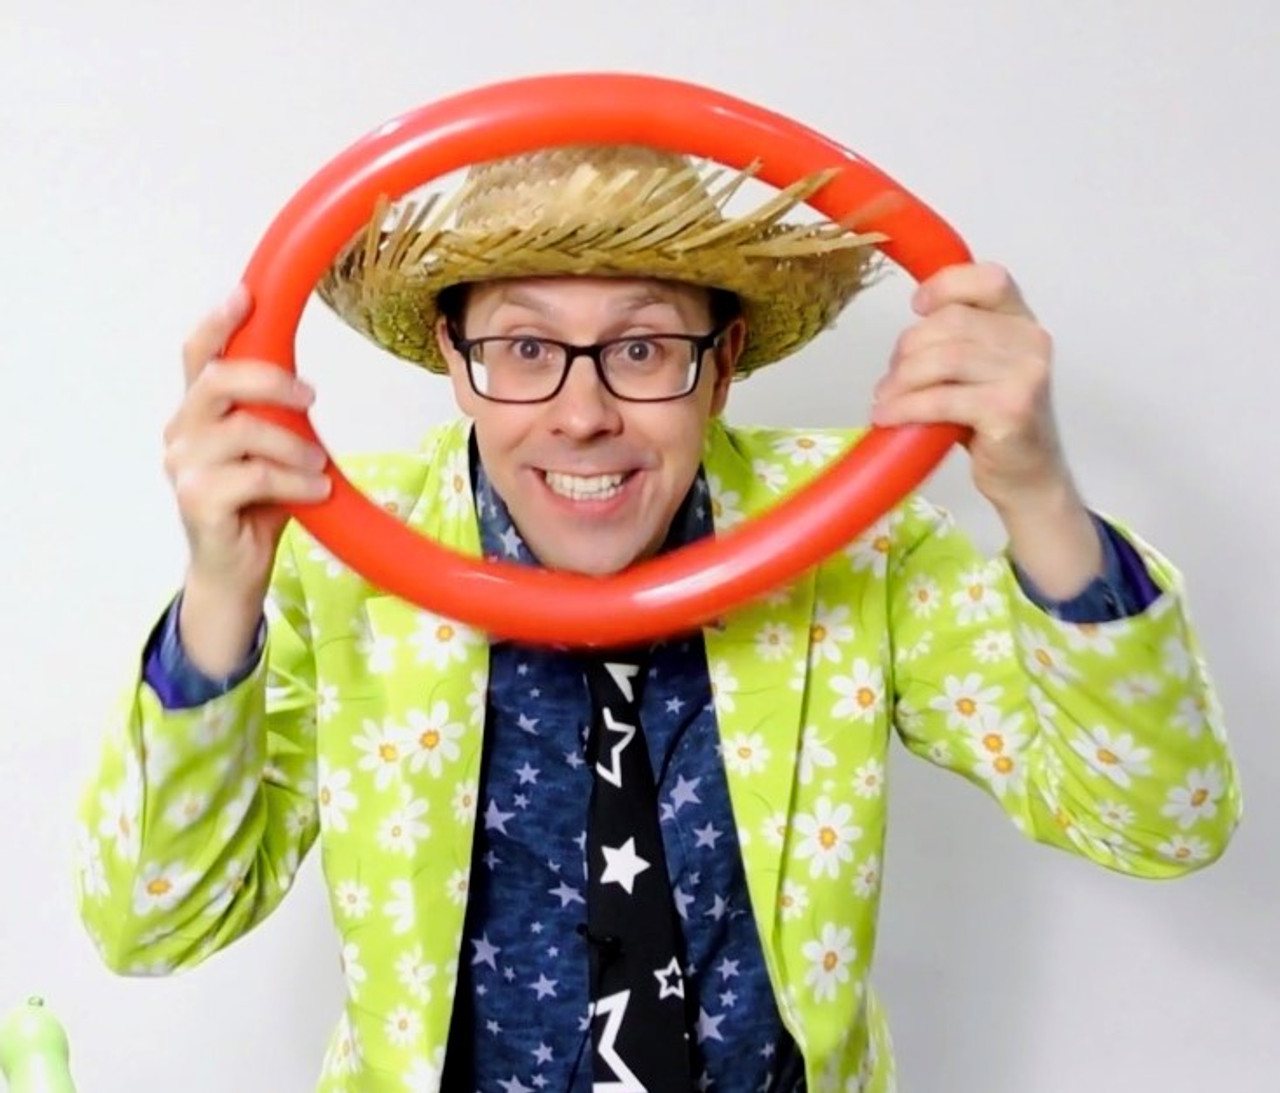 Magic Hatter Comedy Magic Show Children York Funny Tricks